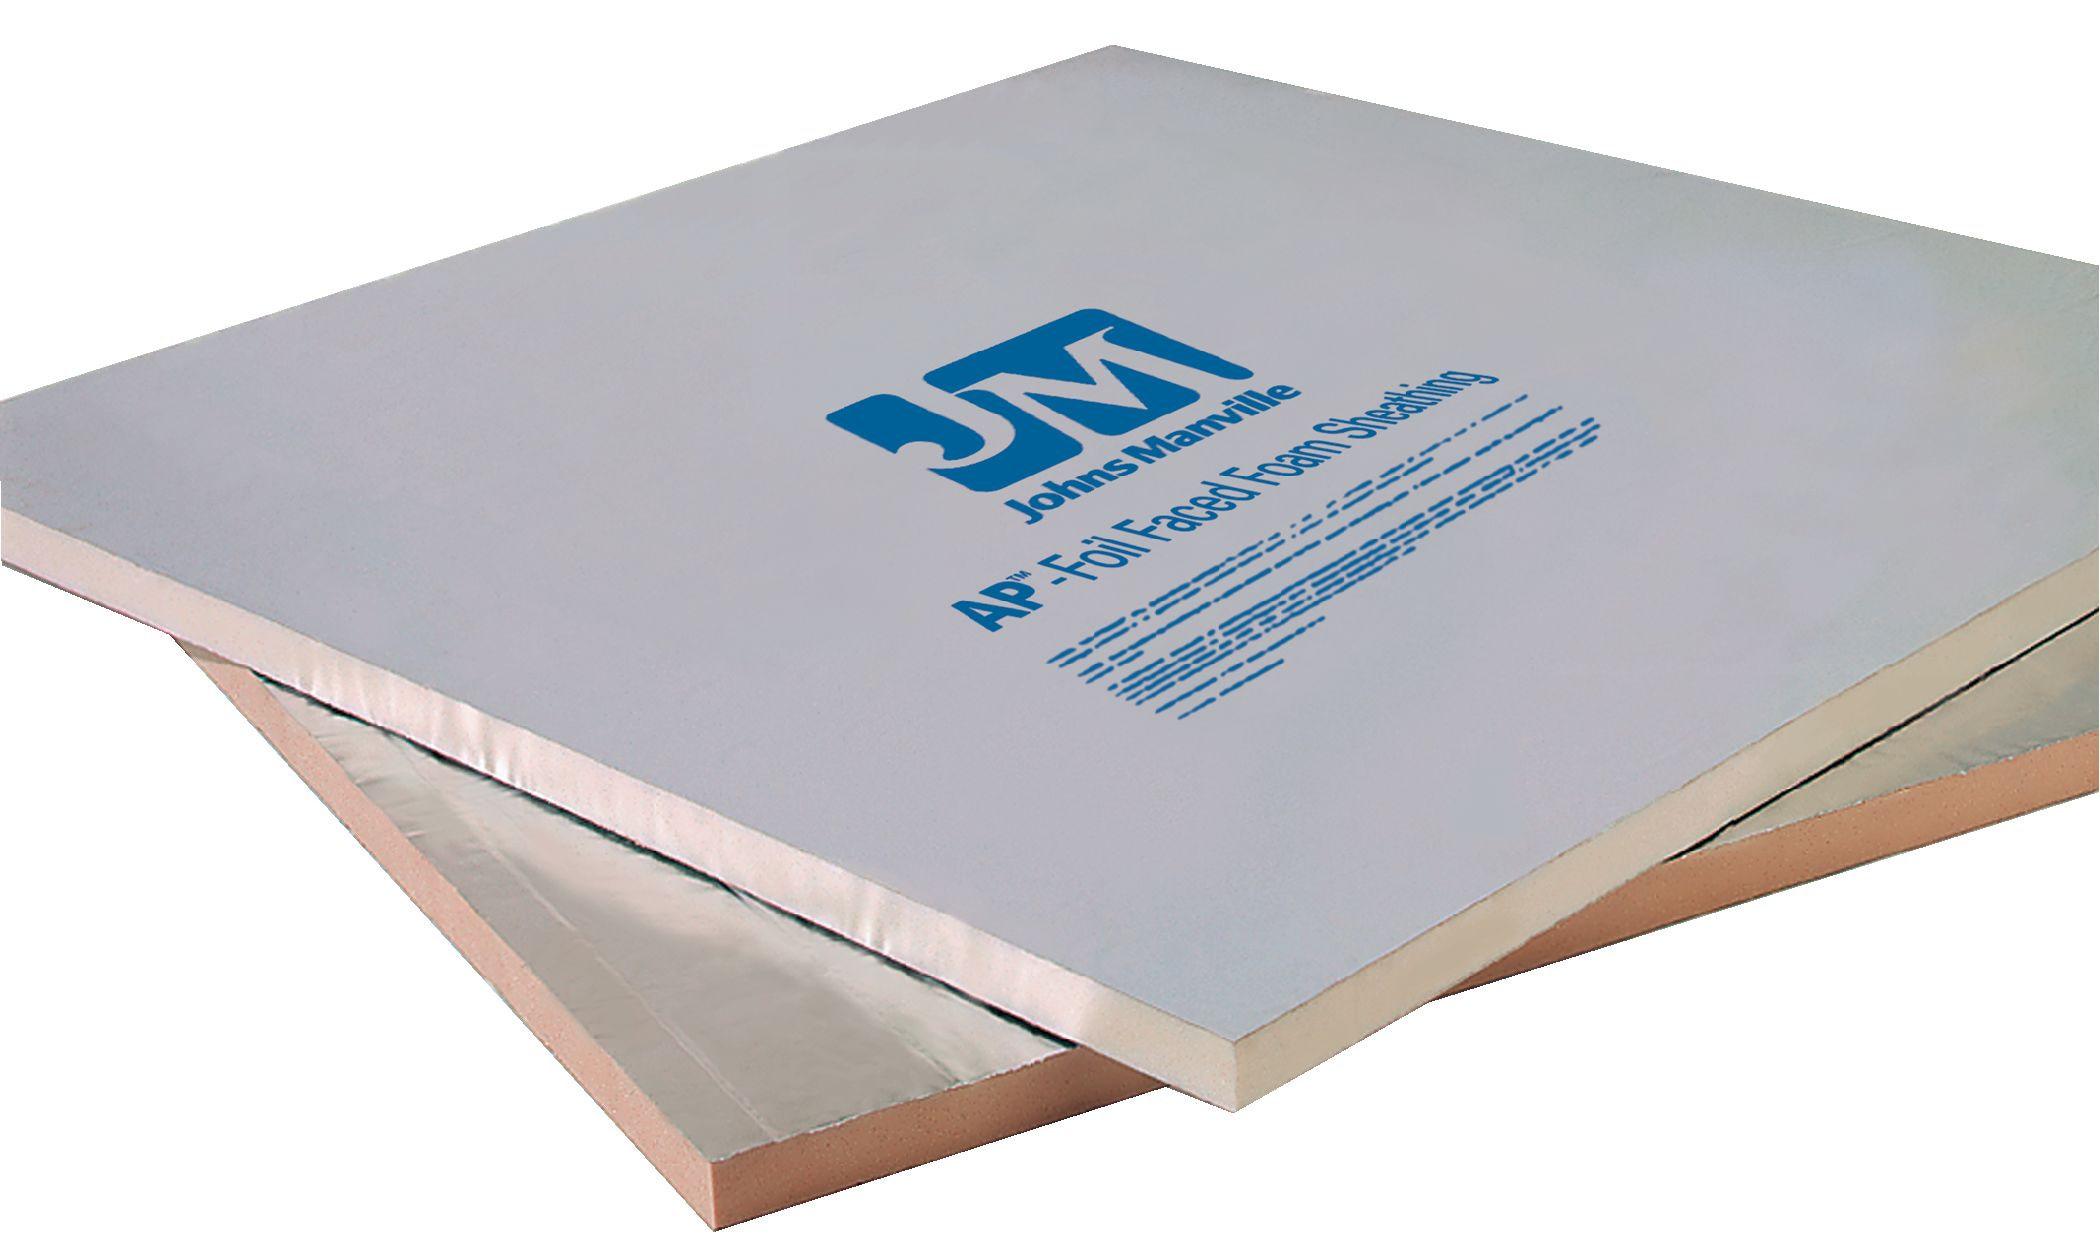 Johns manville ap foil faced foam sheathing for Green board exterior sheathing